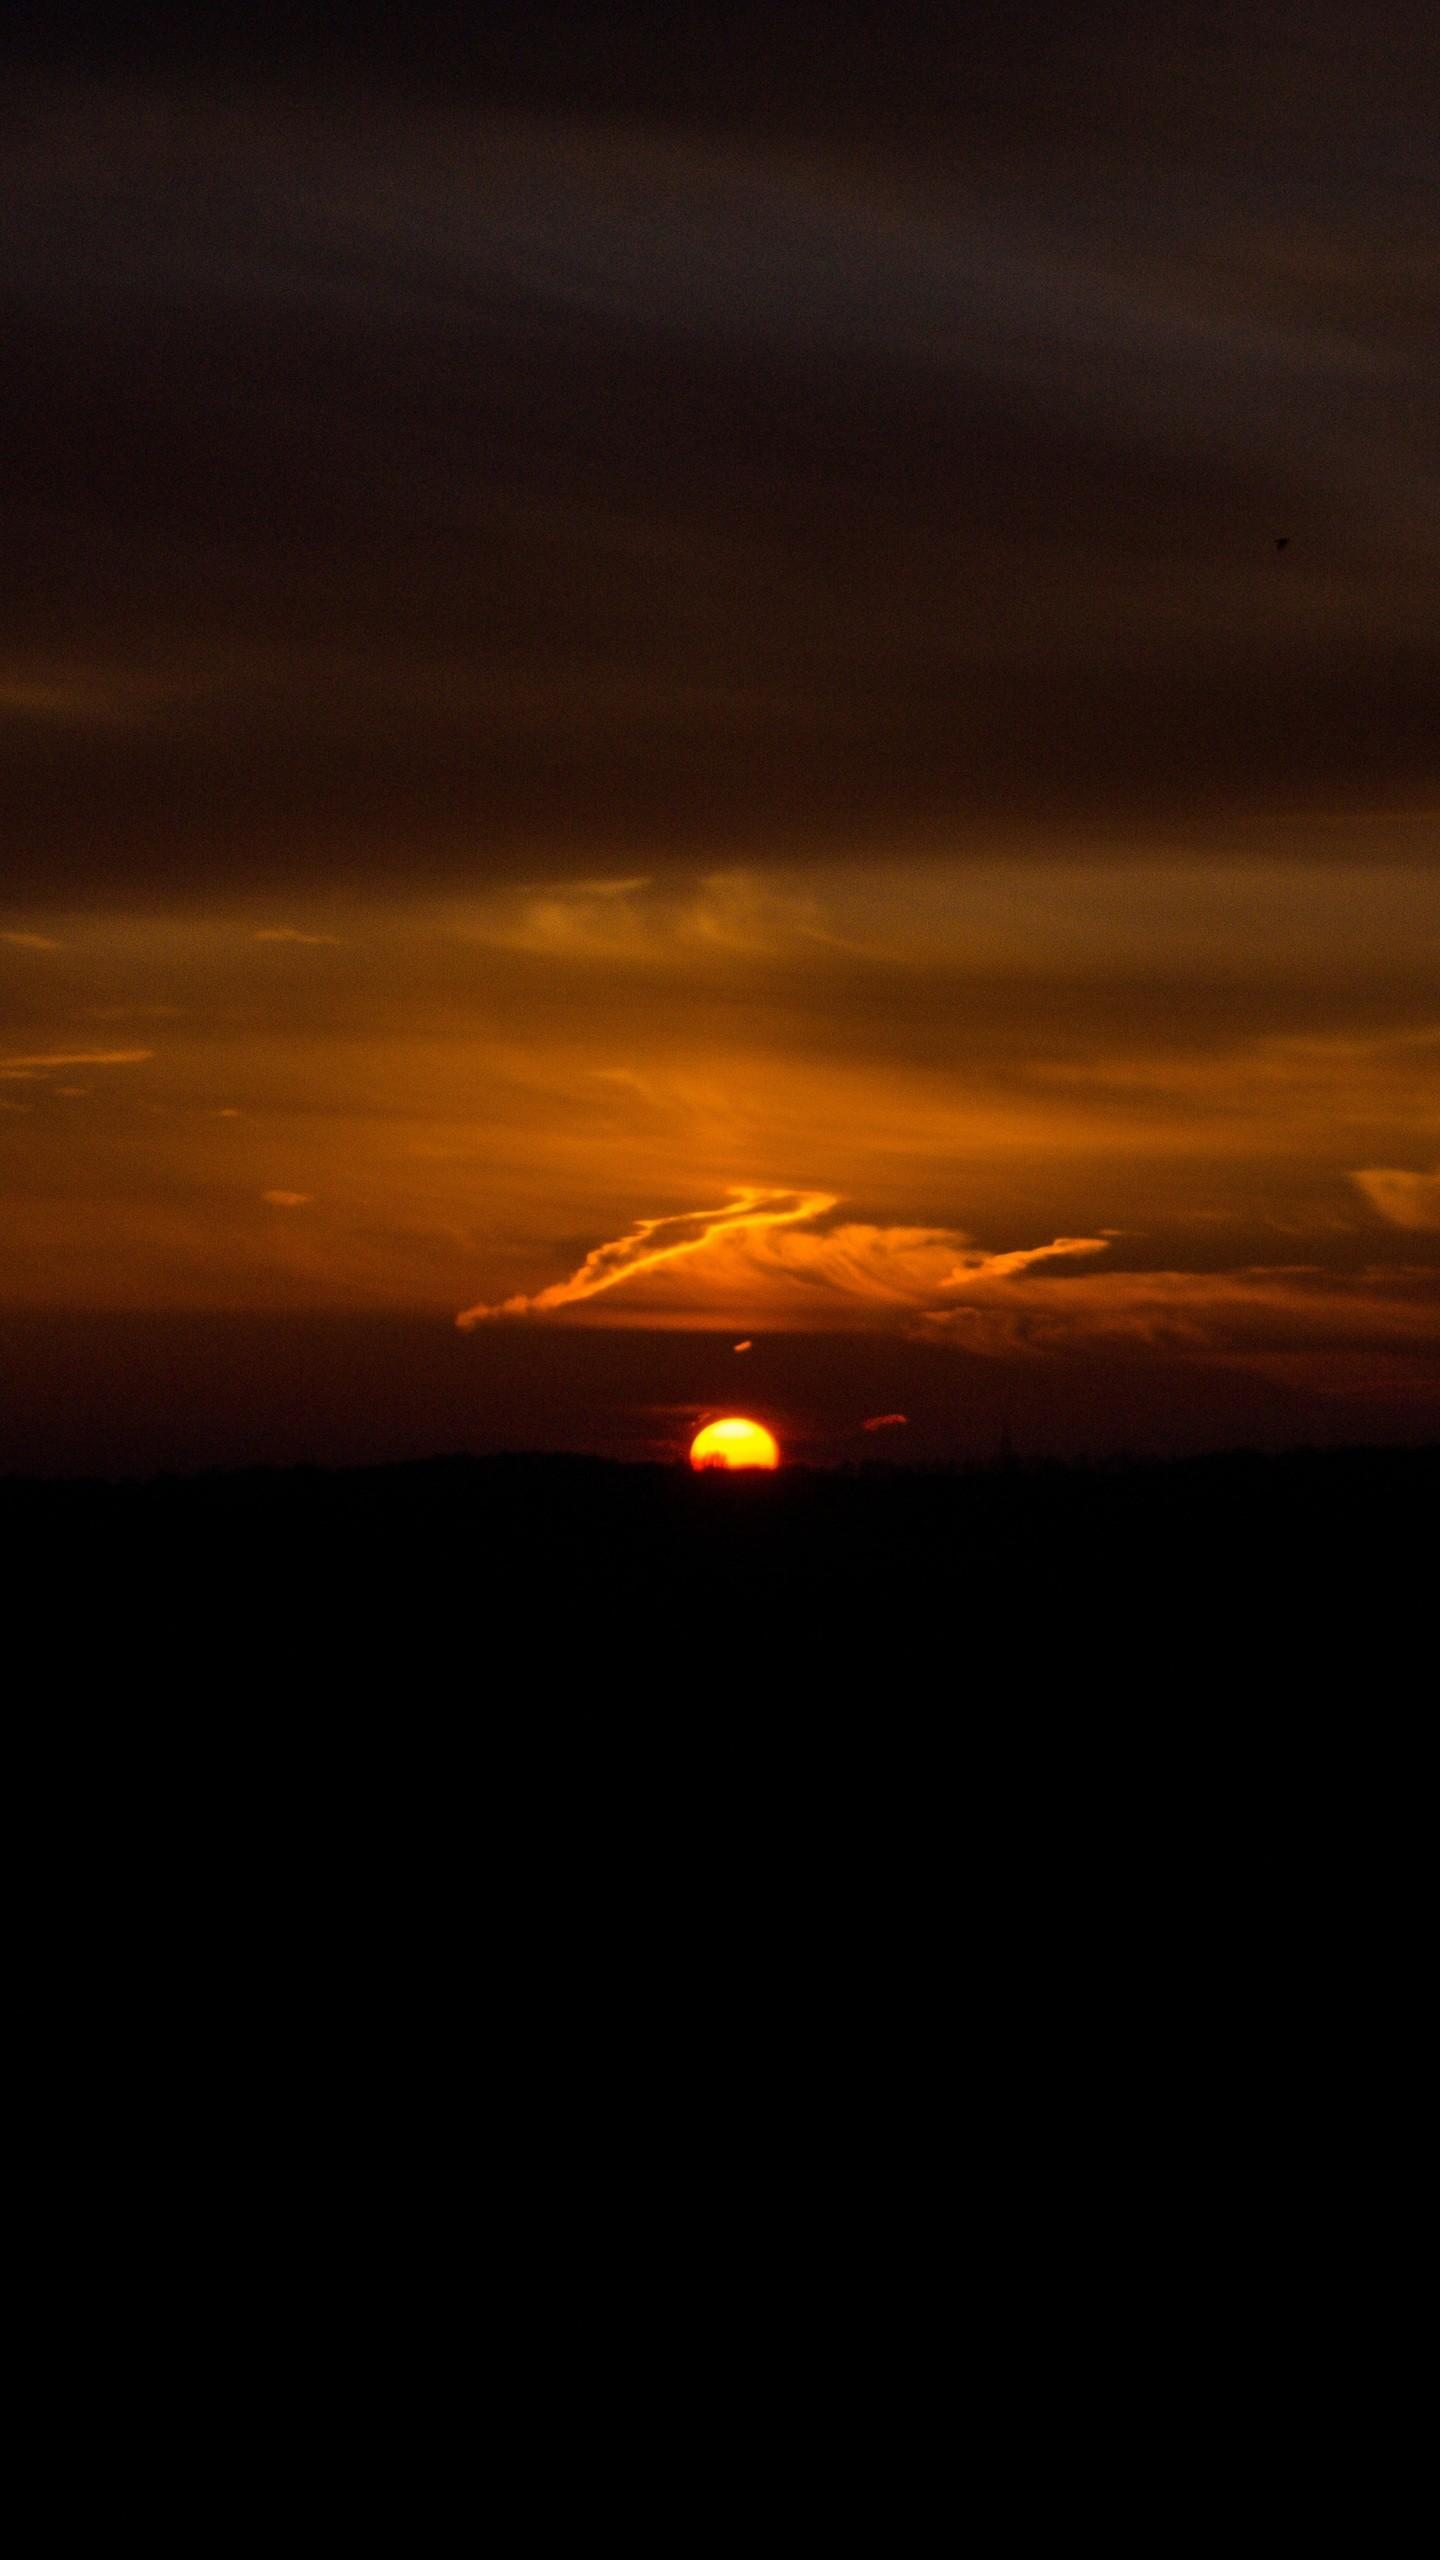 Res: 1440x2560, dark-sunset-evening-4k-bc.jpg